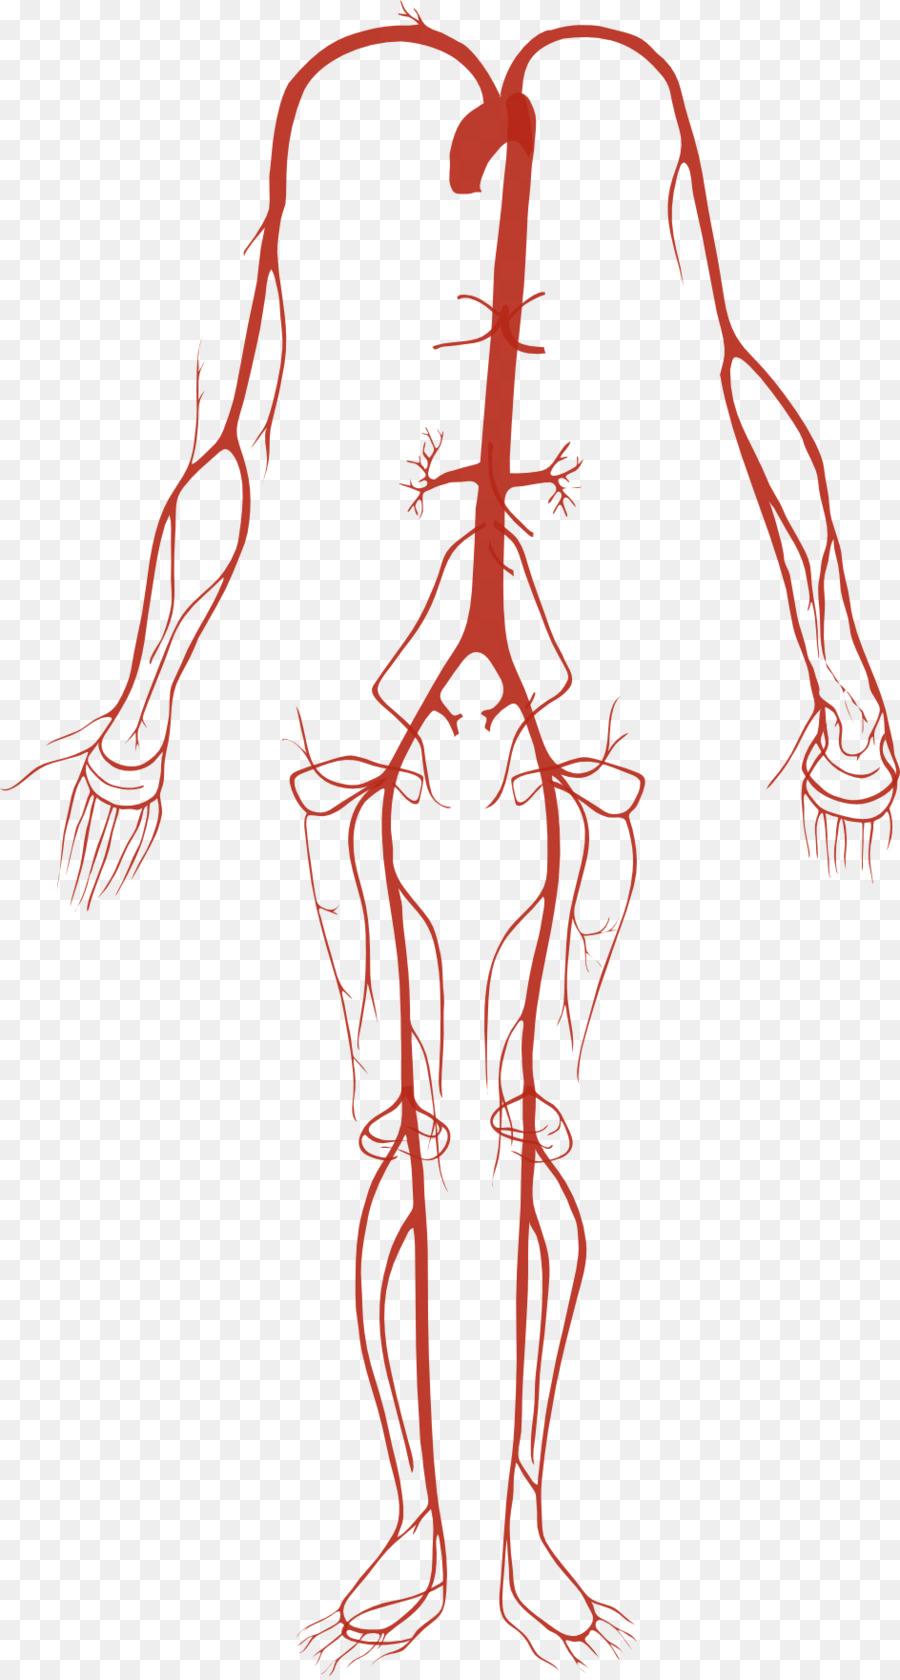 Artery Human Body Circulatory System Anatomy Anatomy Png Download